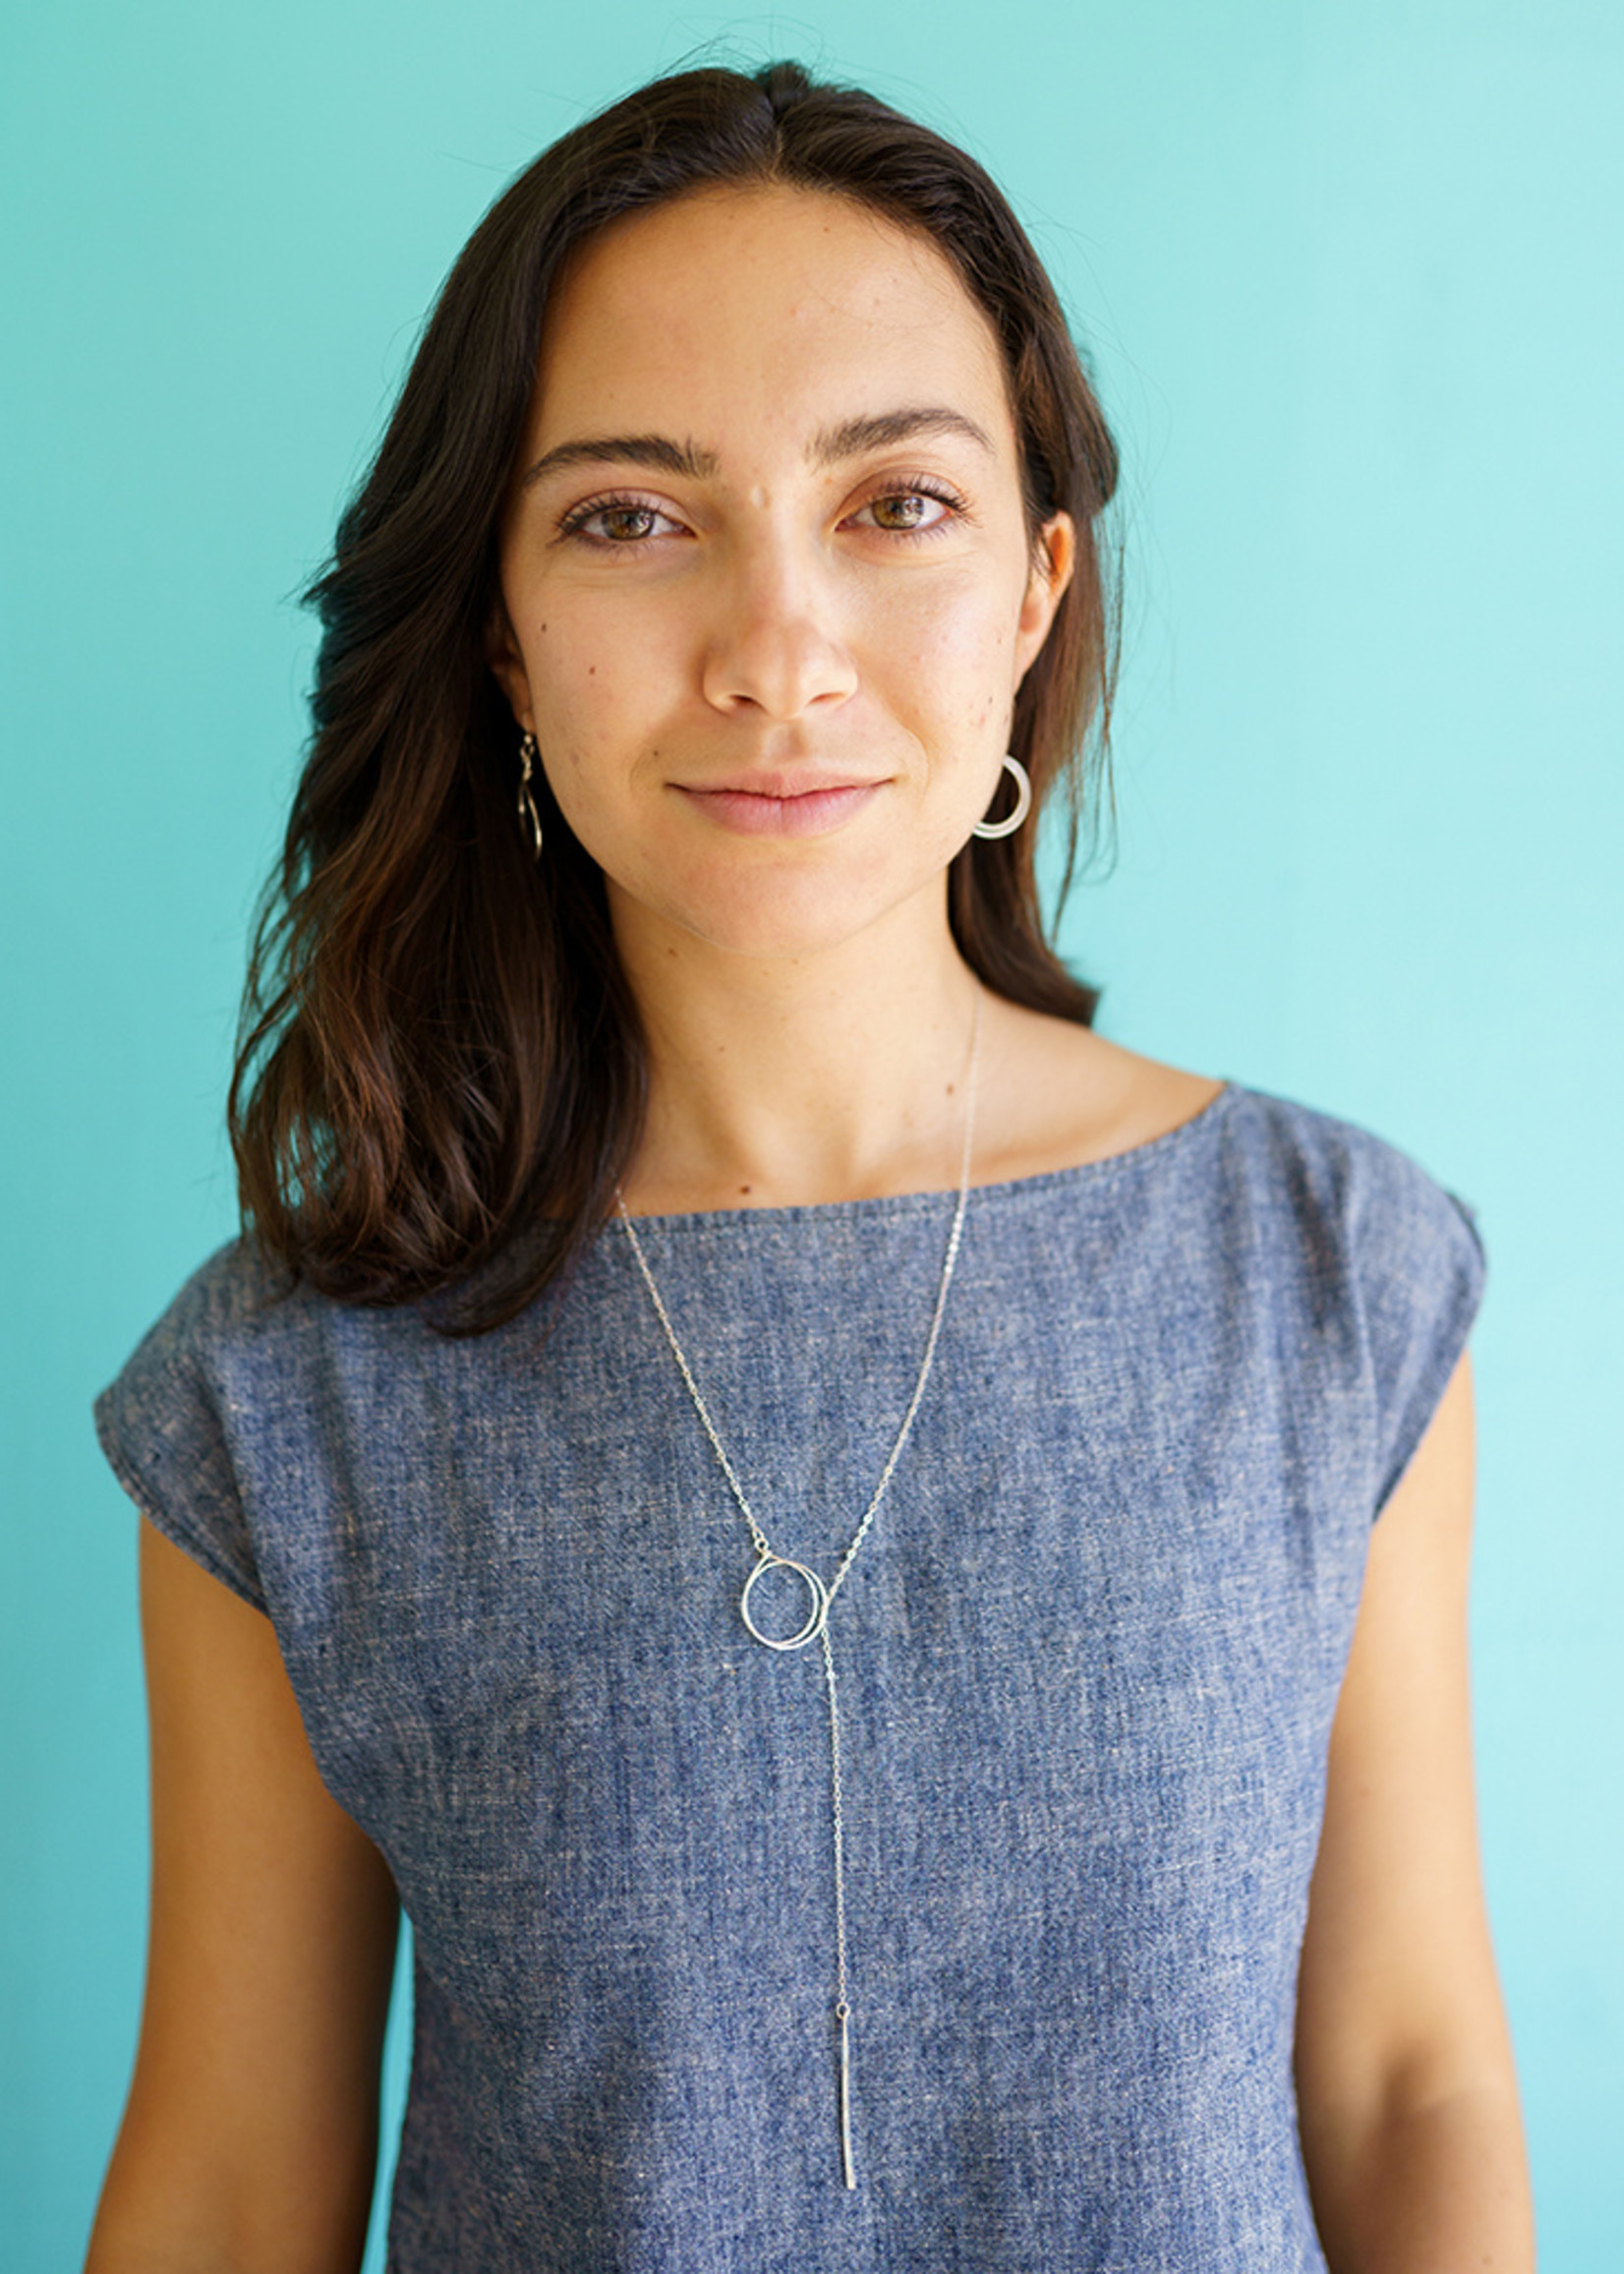 Forai Silver Circle & Line Lariat Necklace